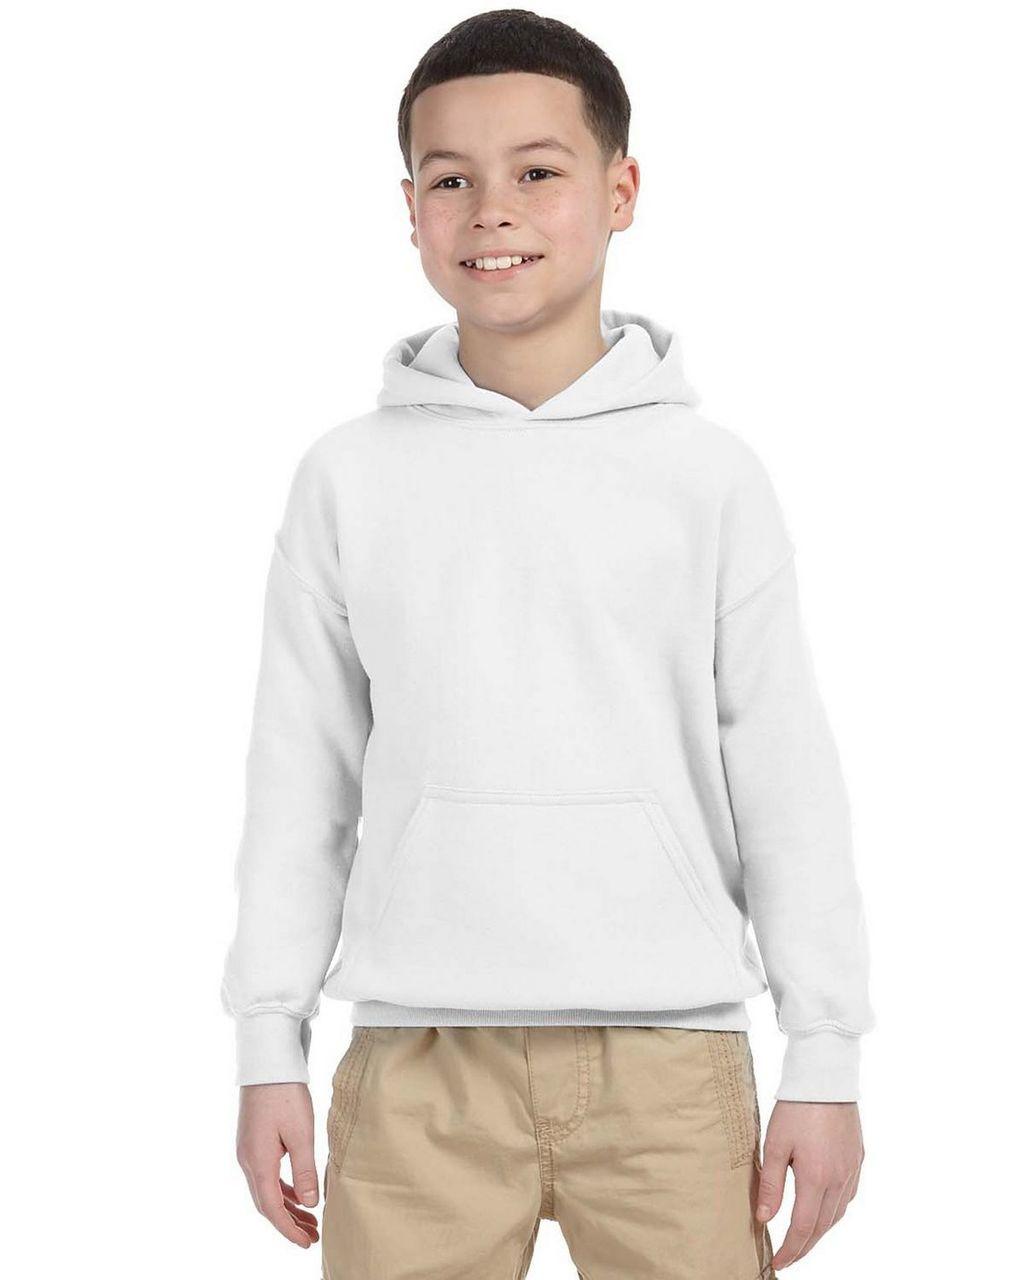 18500B Gildan Youth Hooded Sweatshirt | T-shirt.ca